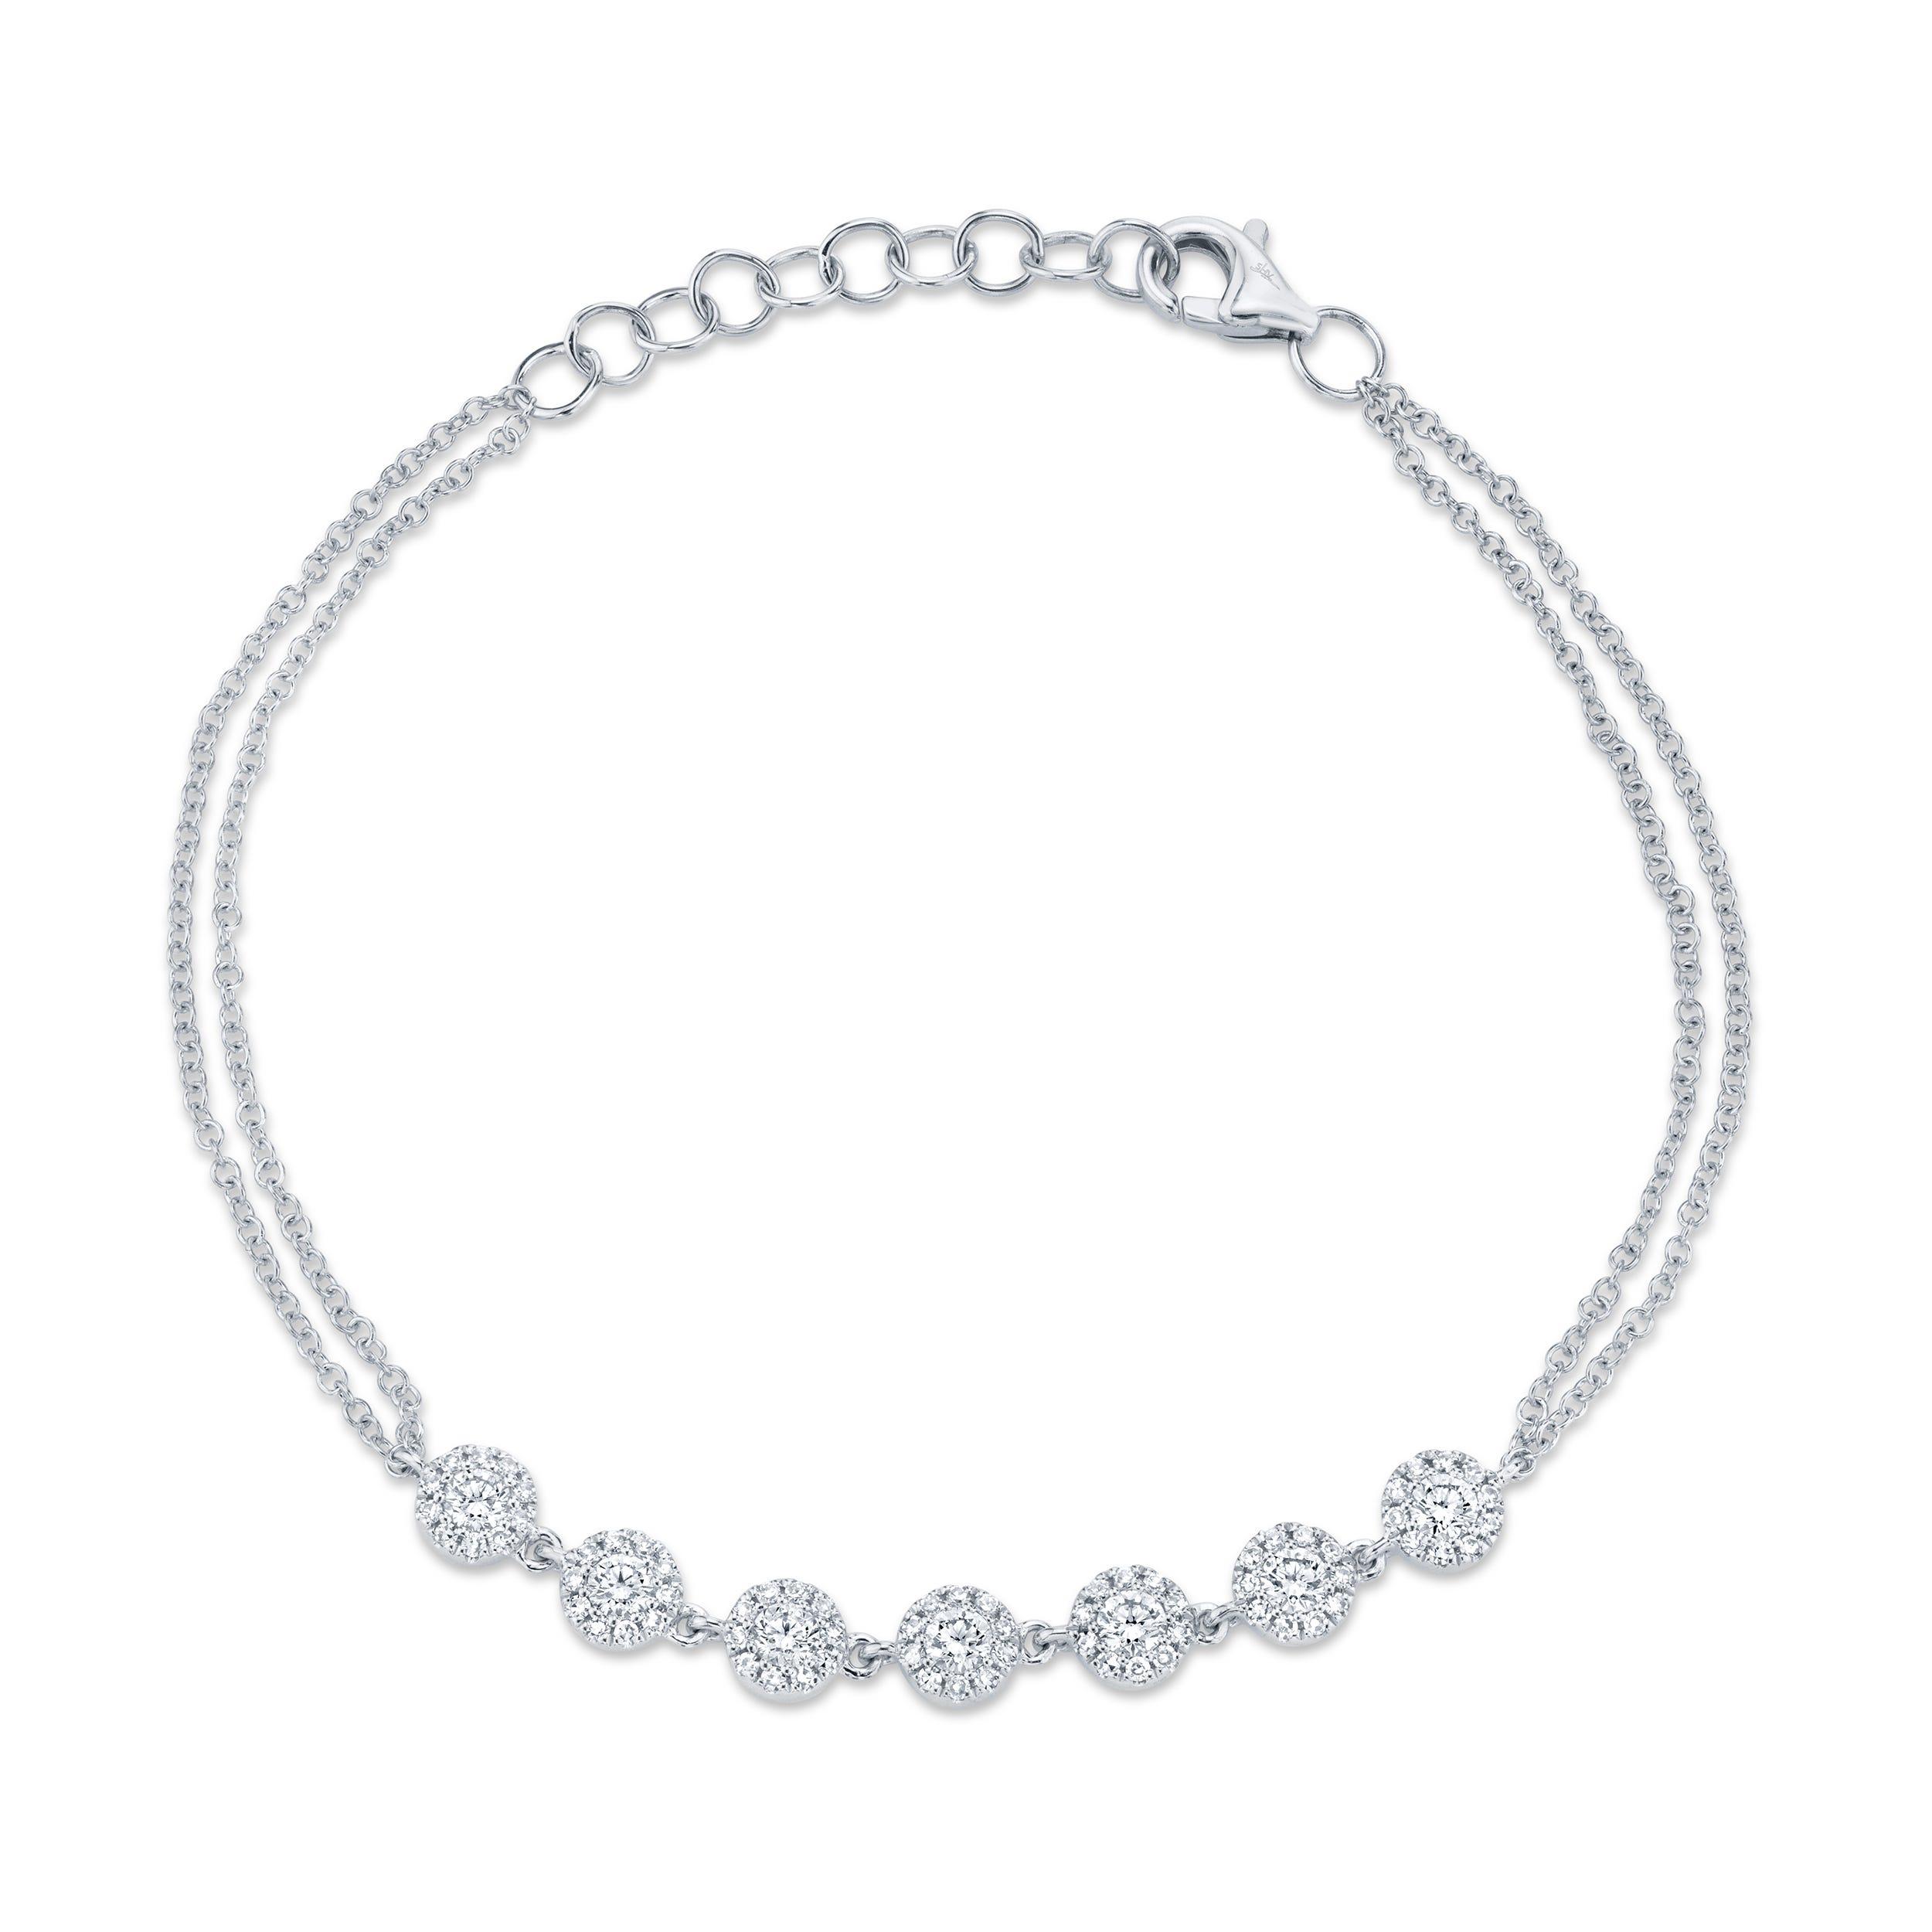 Shy Creation Diamond Cluster Link Bracelet in 14k White Gold SC55004941